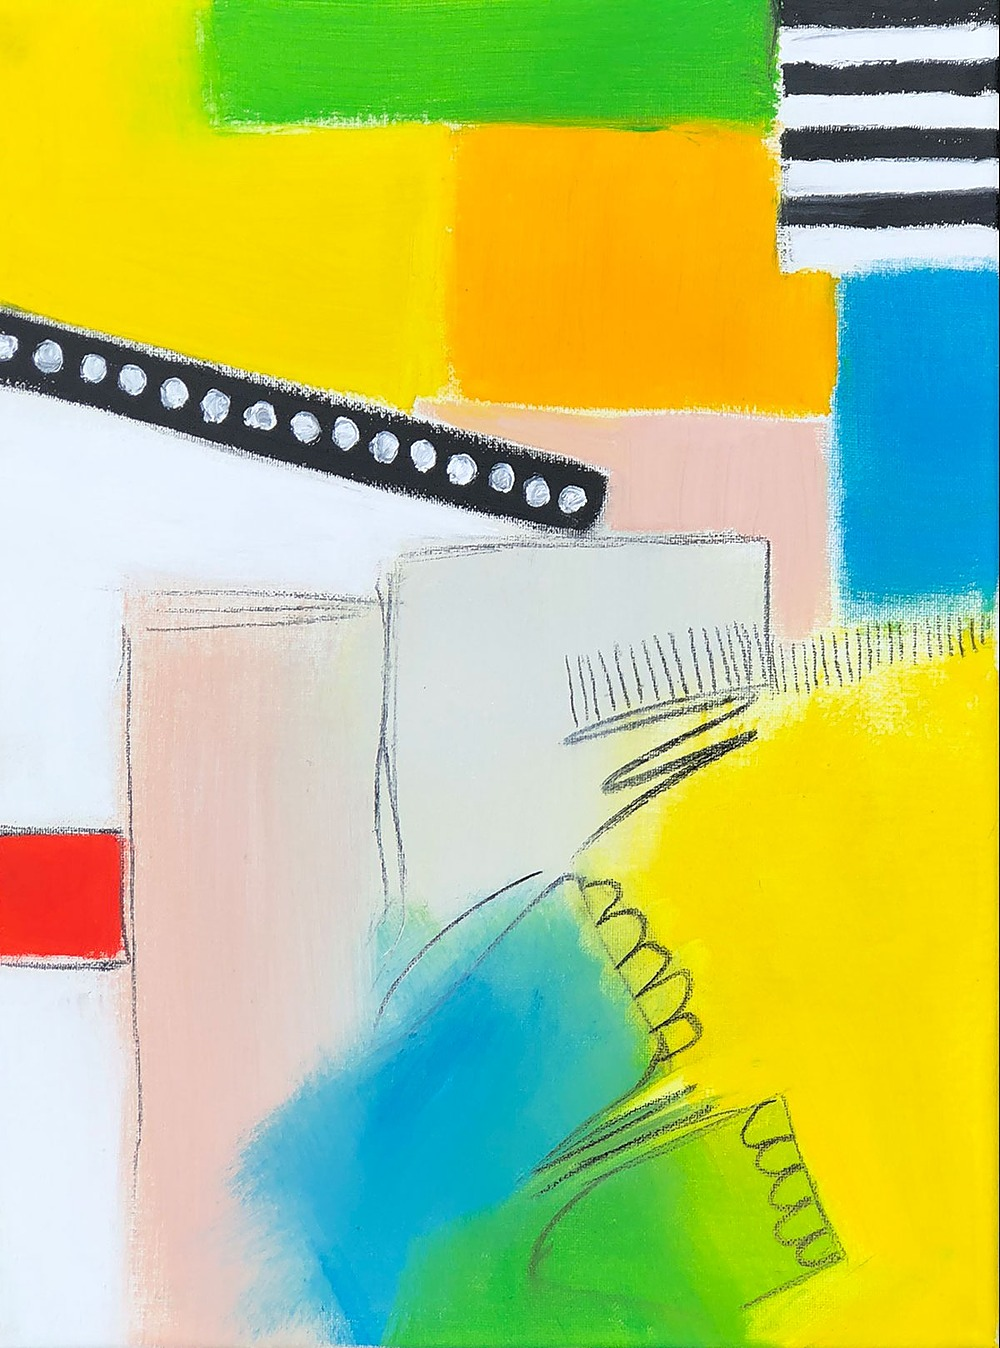 Natural Rhythm by Judy Hintz Cox   ArtworkNetwork.com